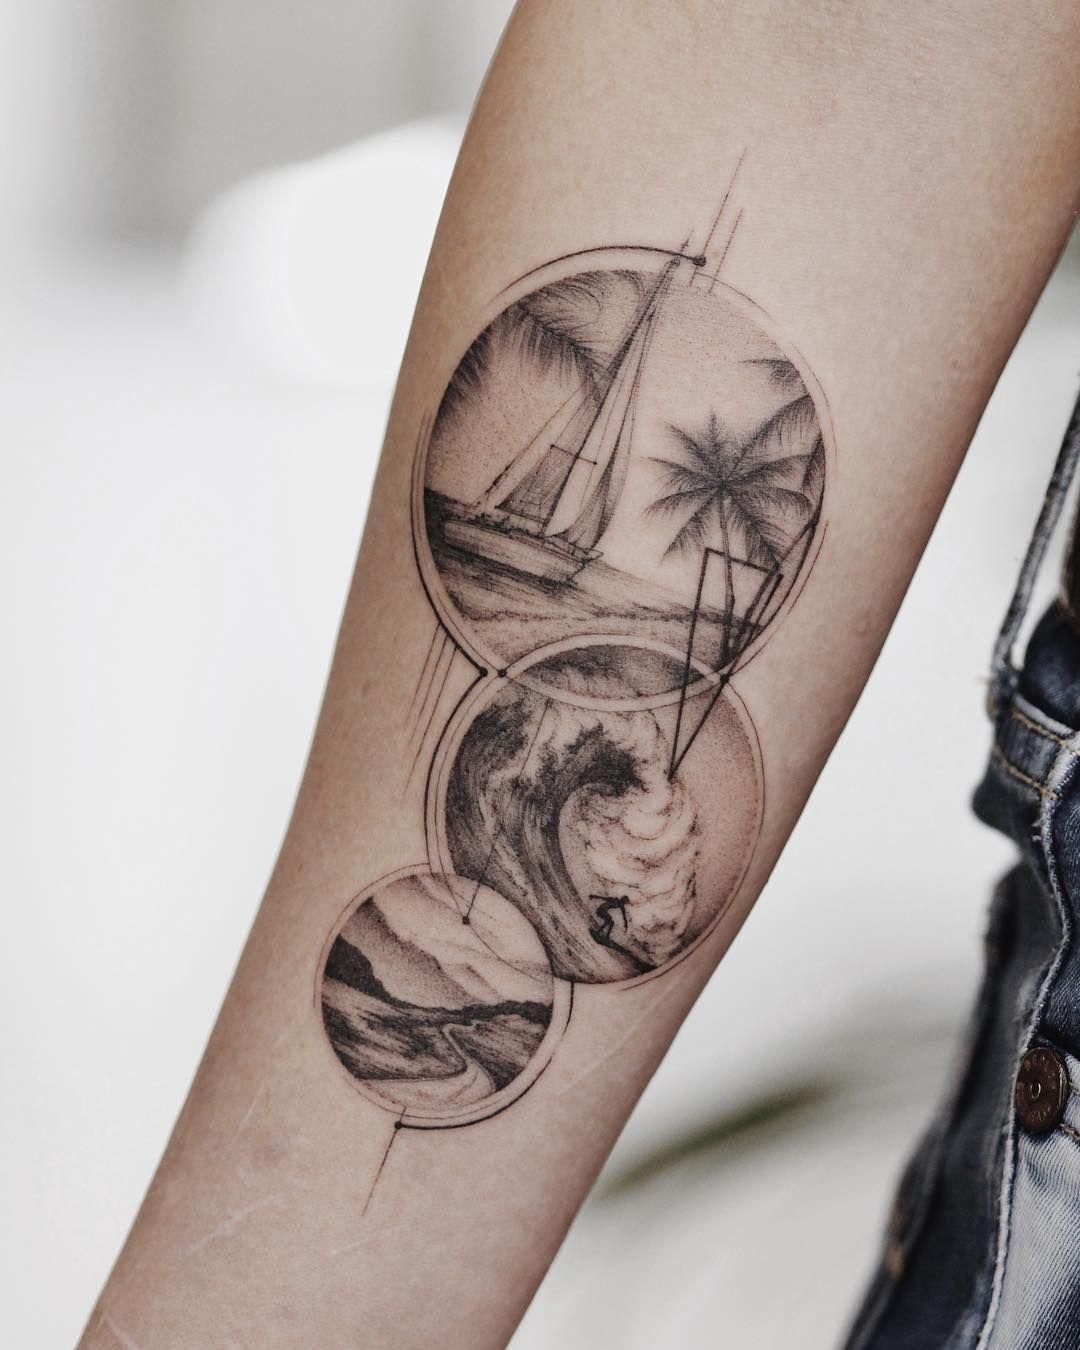 Fantastico идеи для татуировки